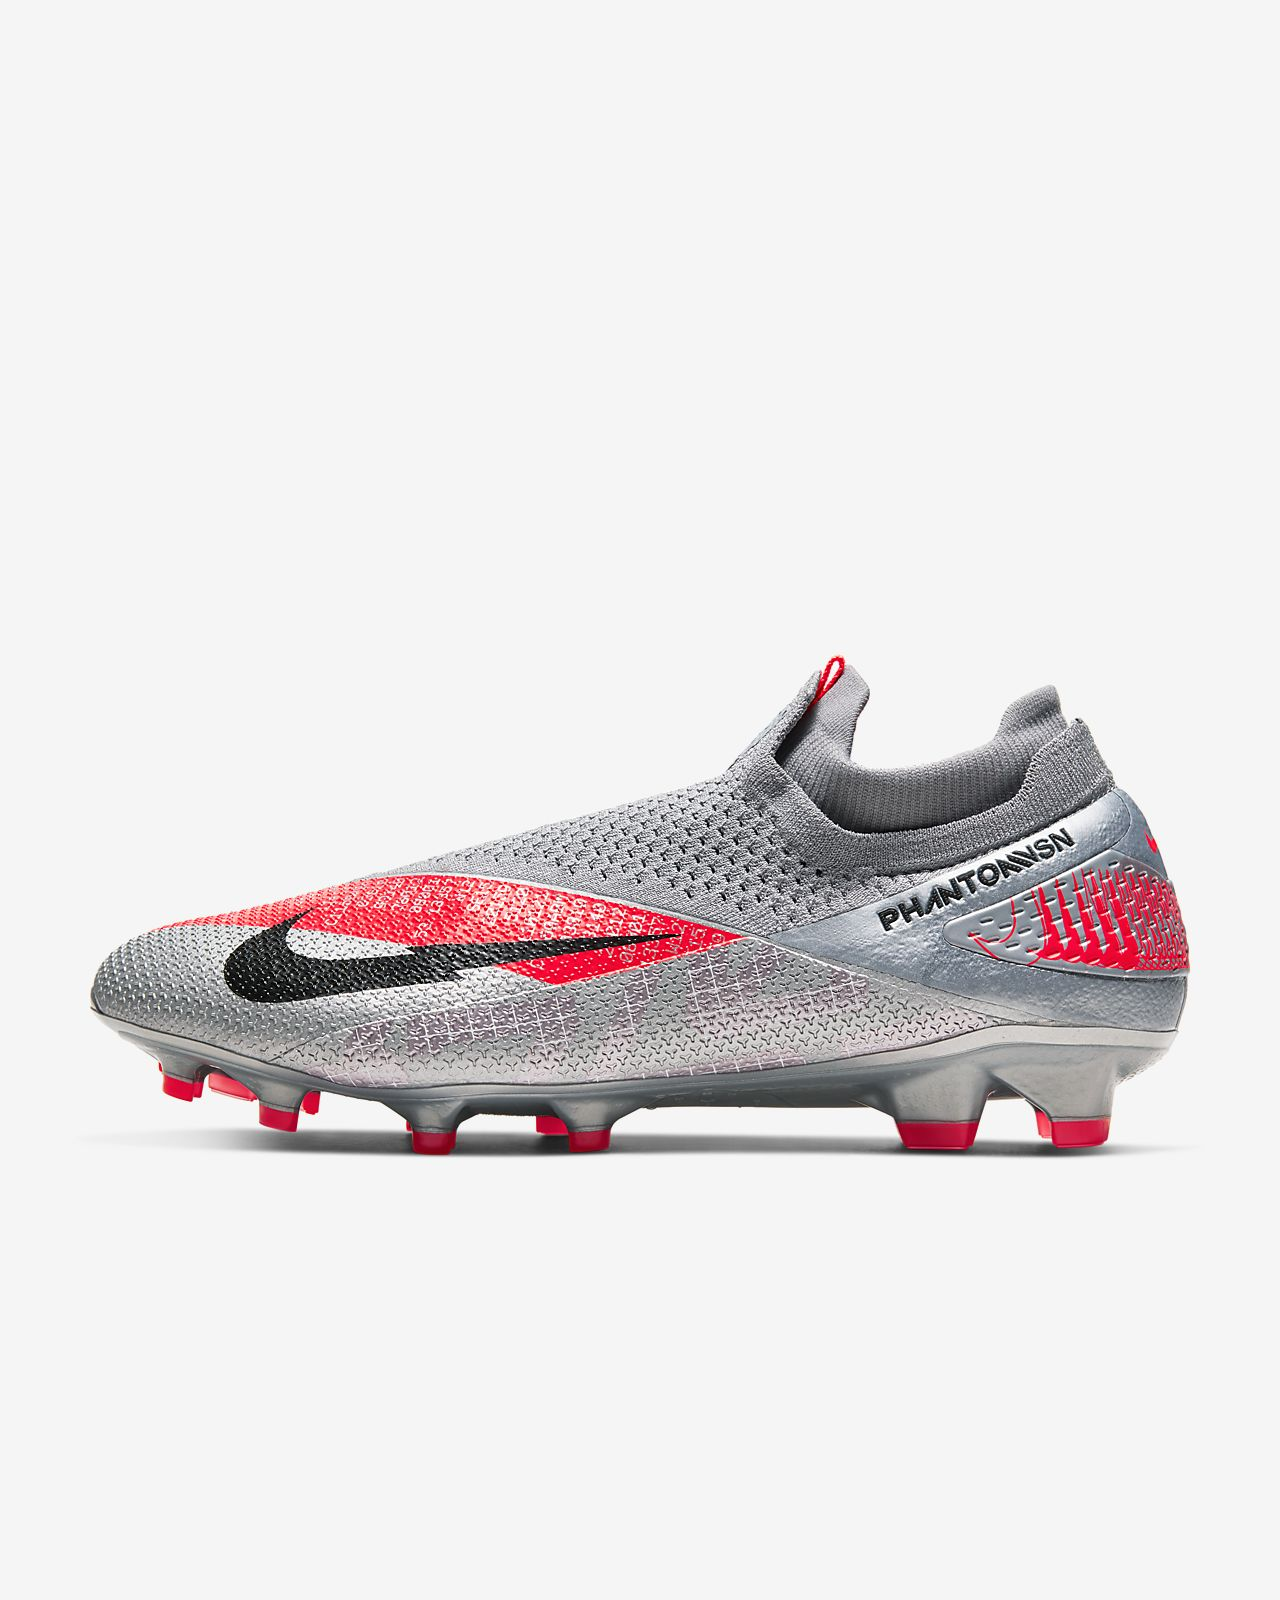 Nike Phantom Vision 2 Elite Dynamic Fit FG Firm-Ground Soccer Cleat